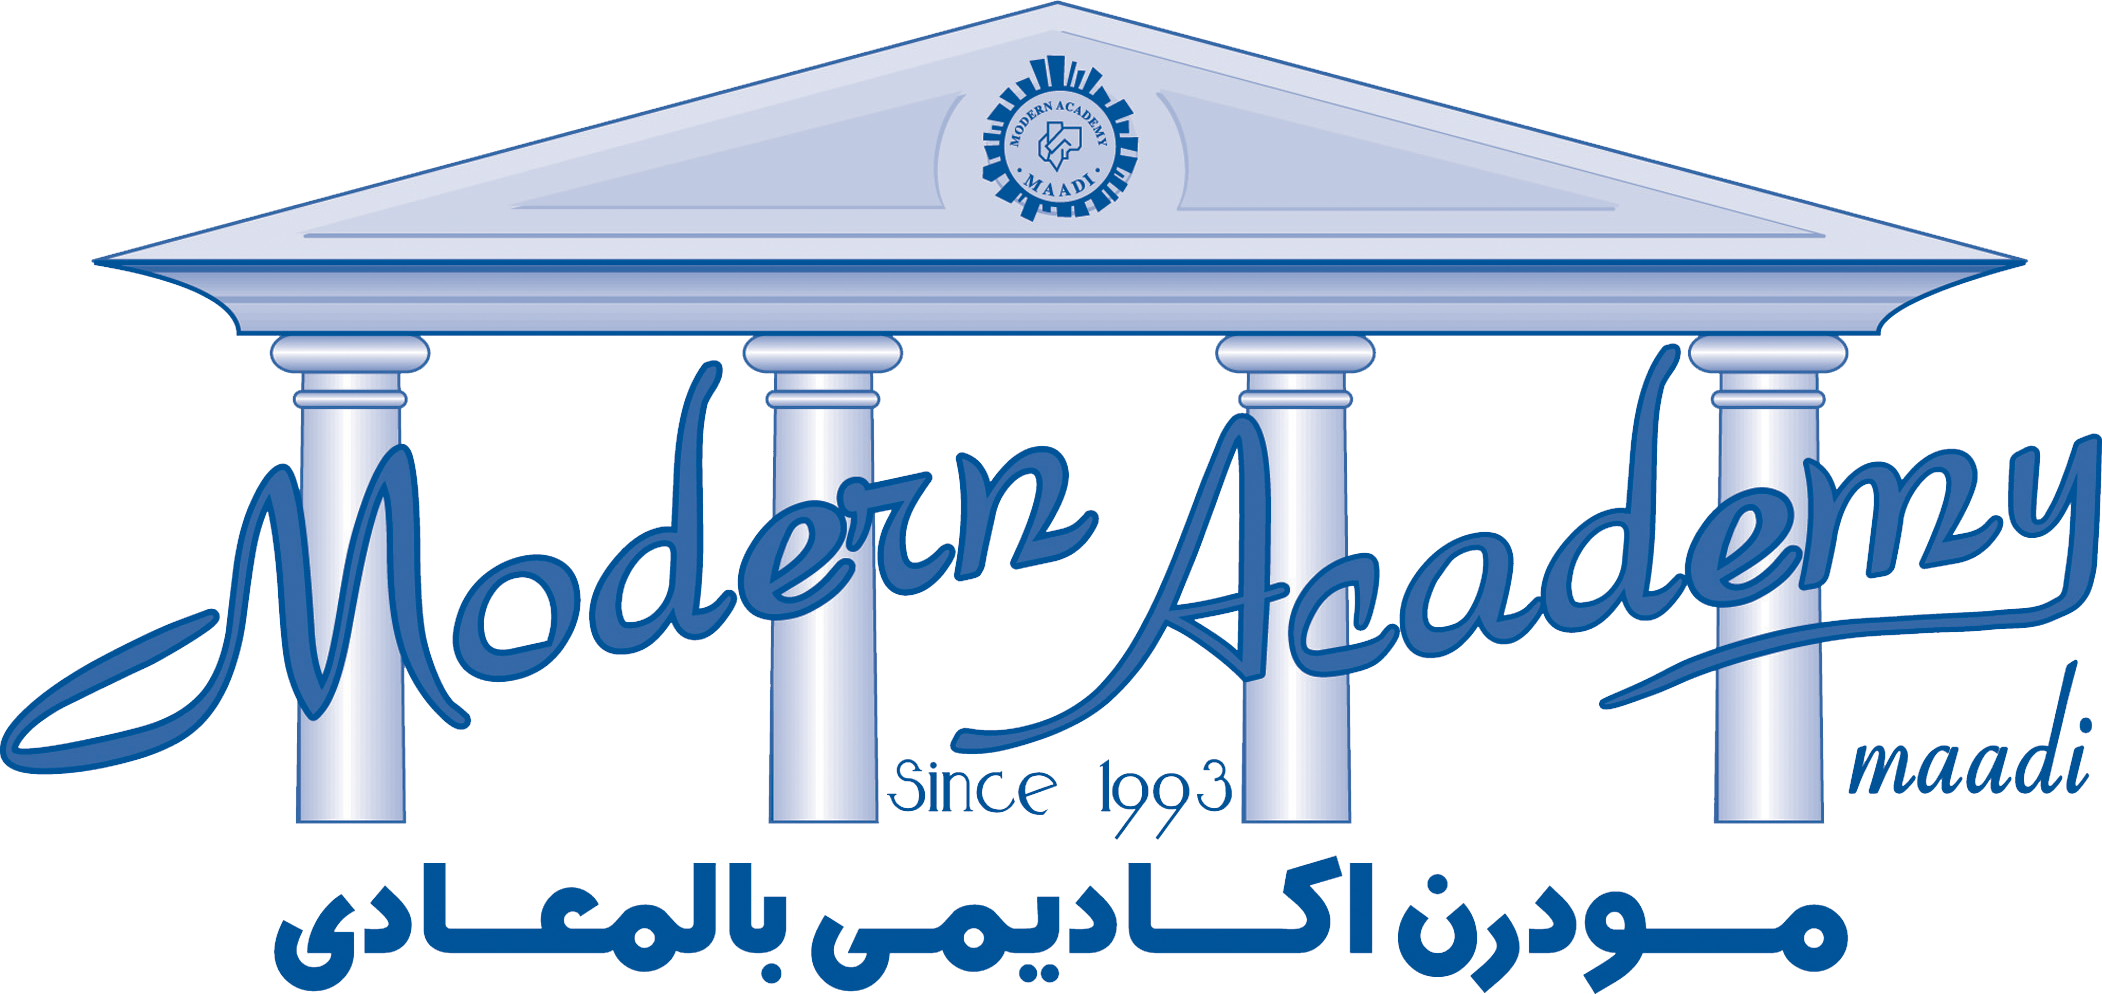 Modern Academy in Maadi